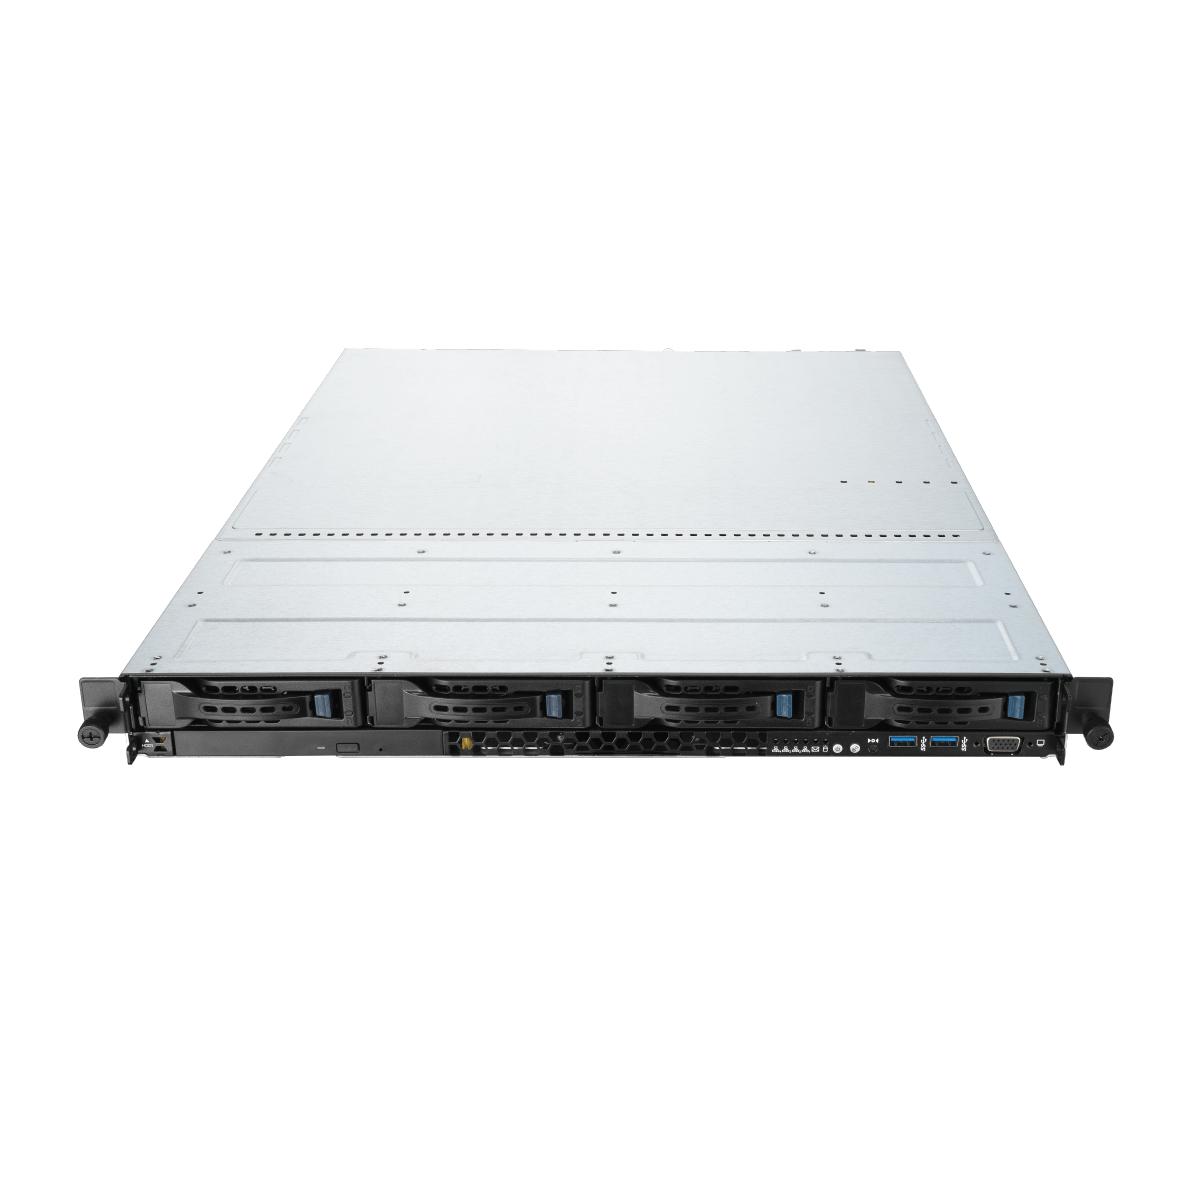 ASUS Server - RS500A